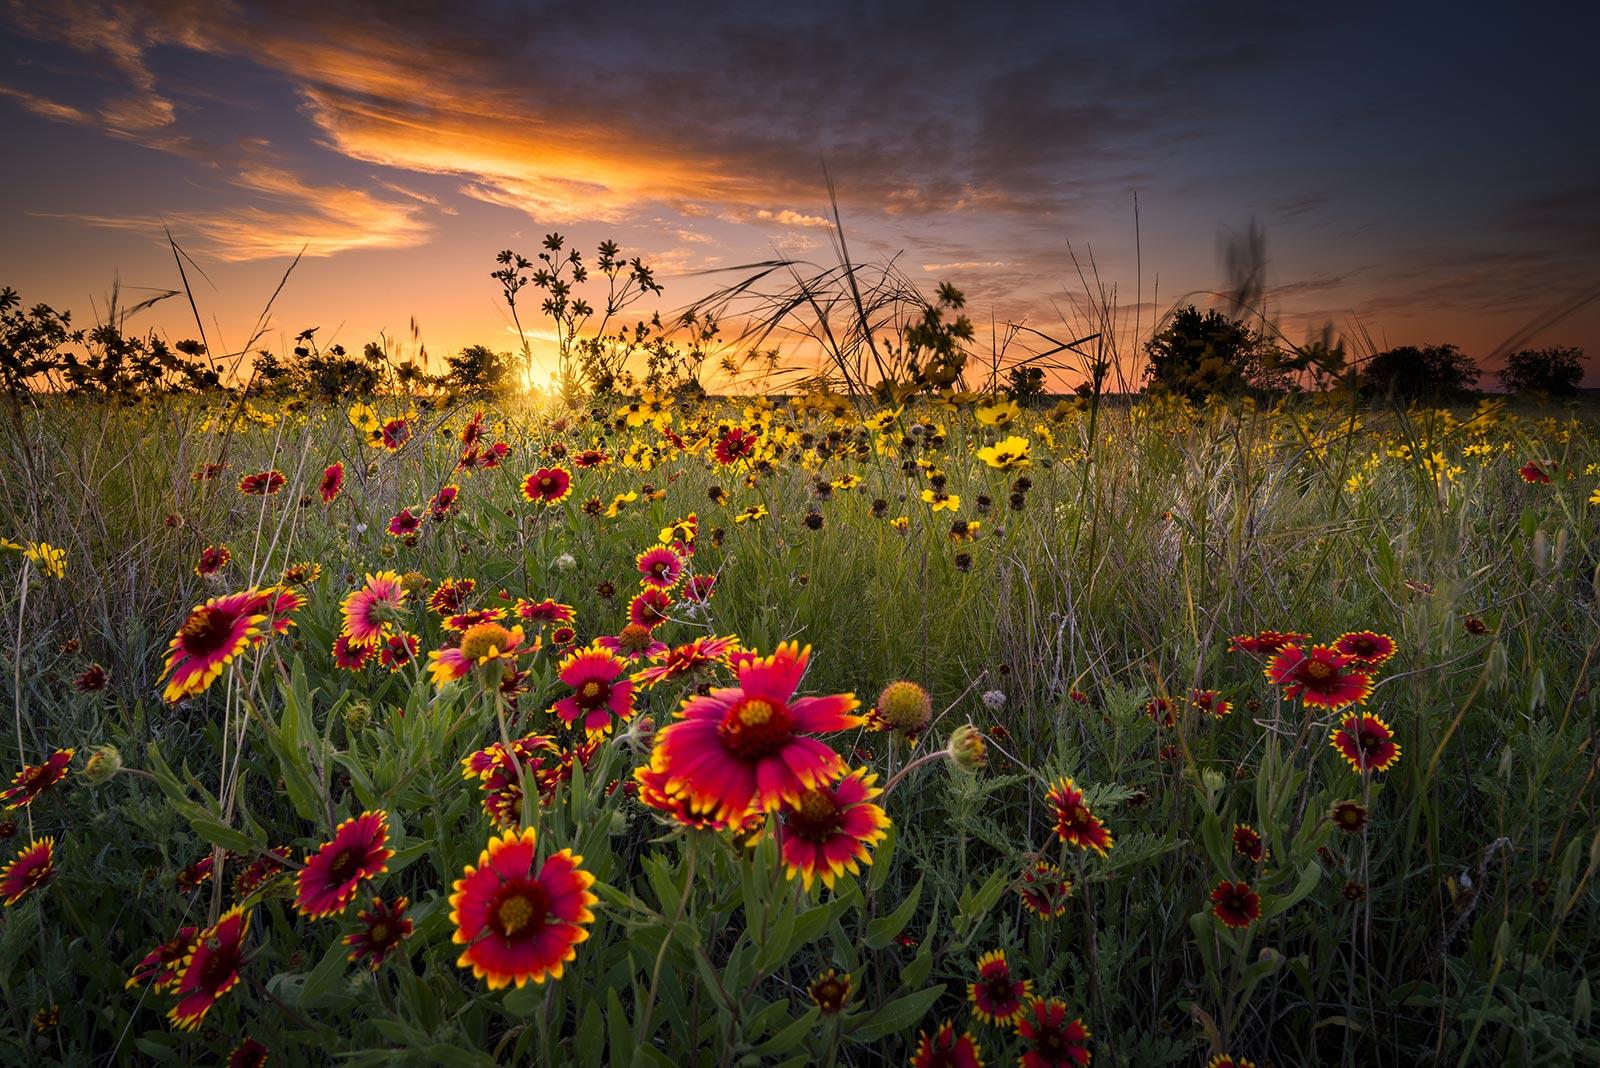 WildflowerSunset.jpg